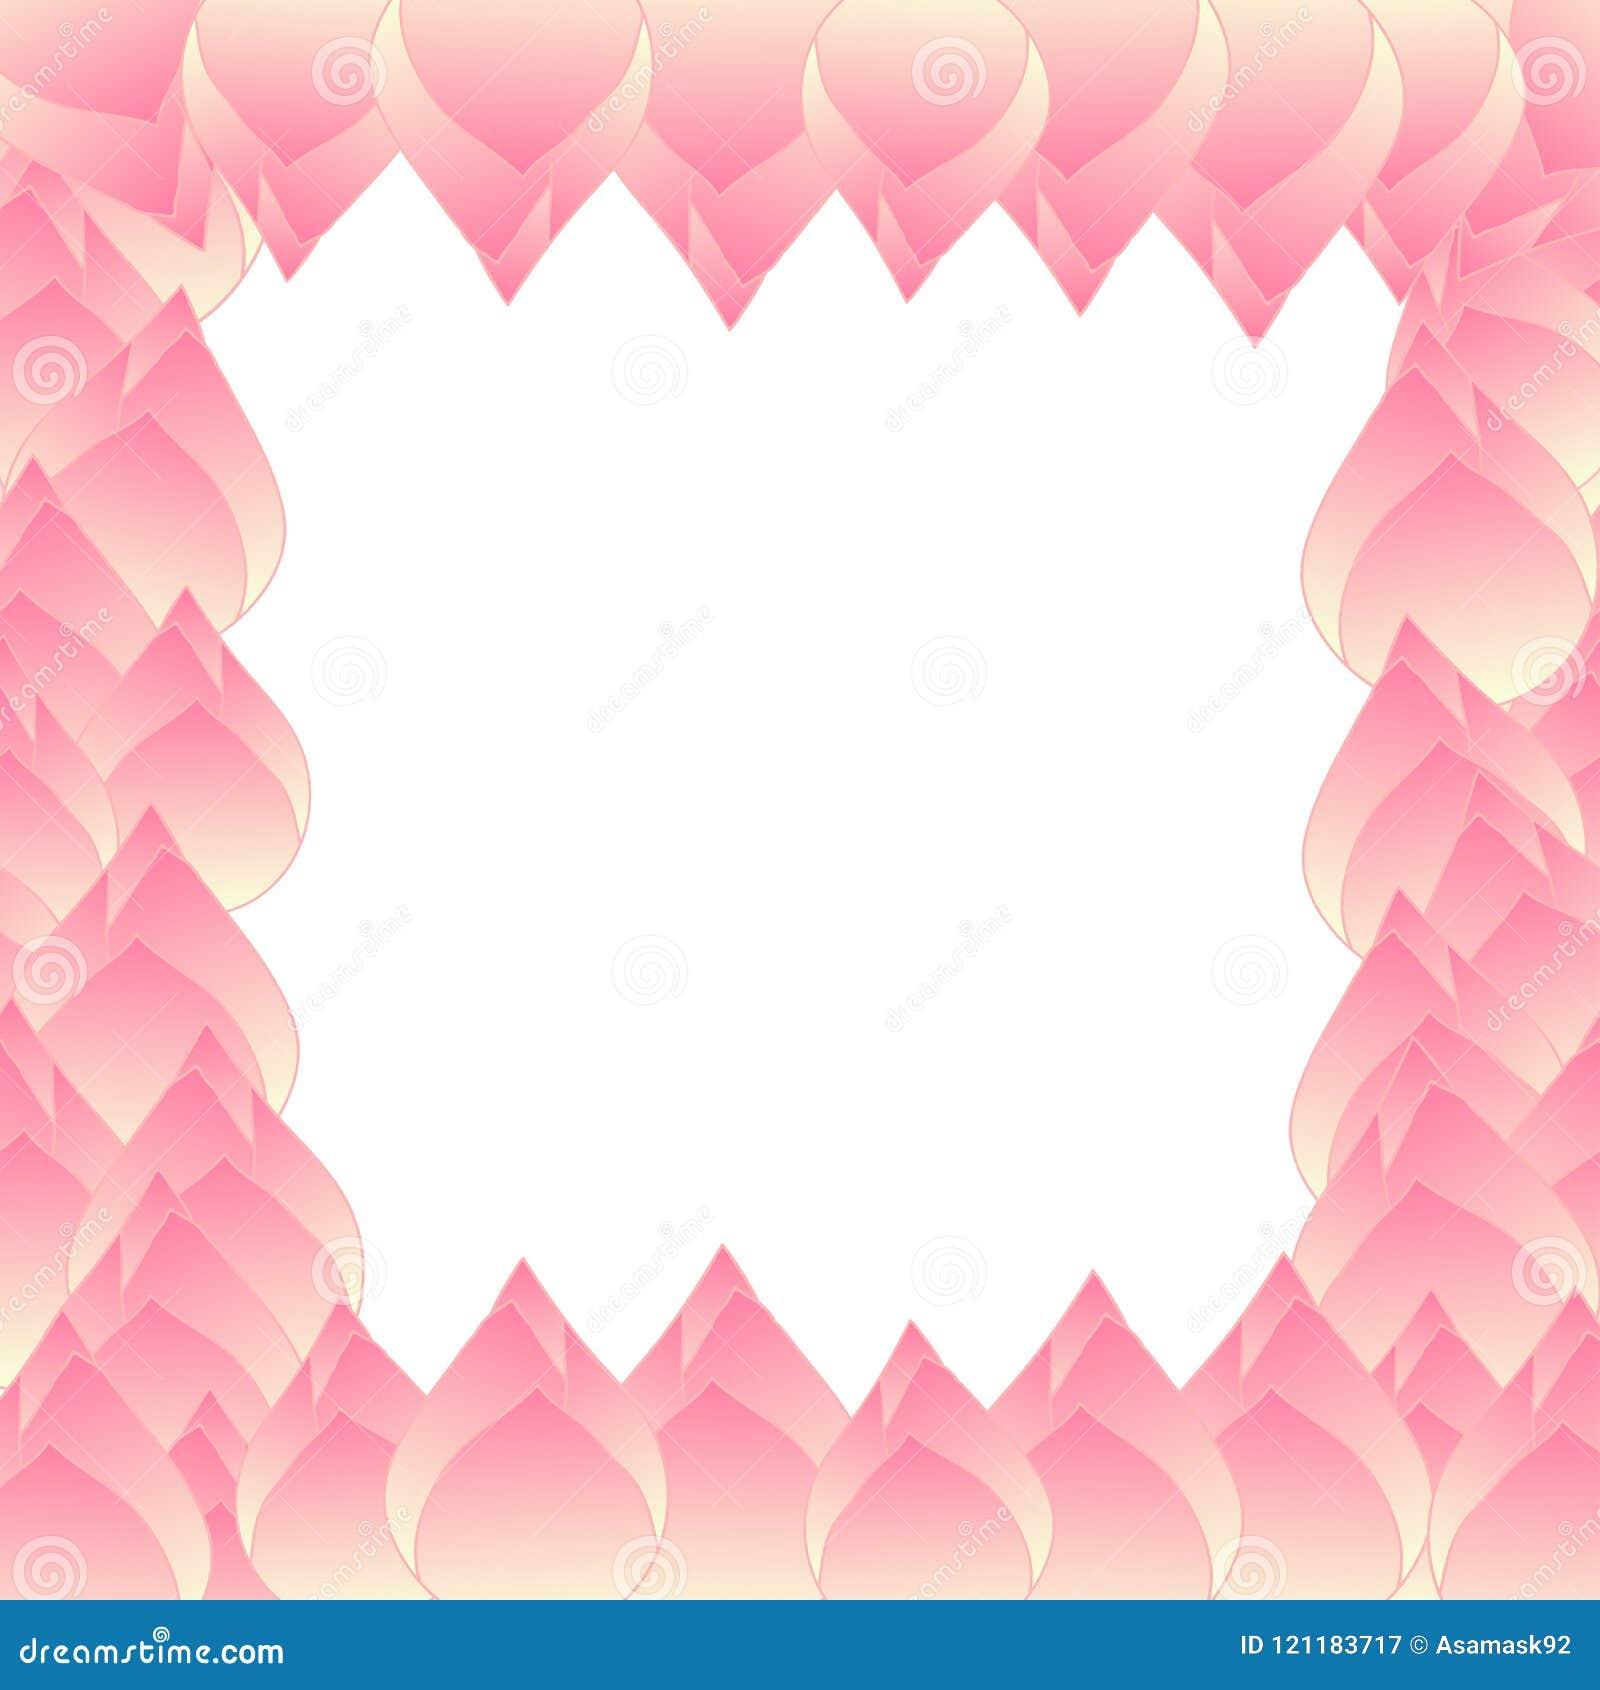 Pink Bud Indian Lotus Border Stock Vector Illustration Of